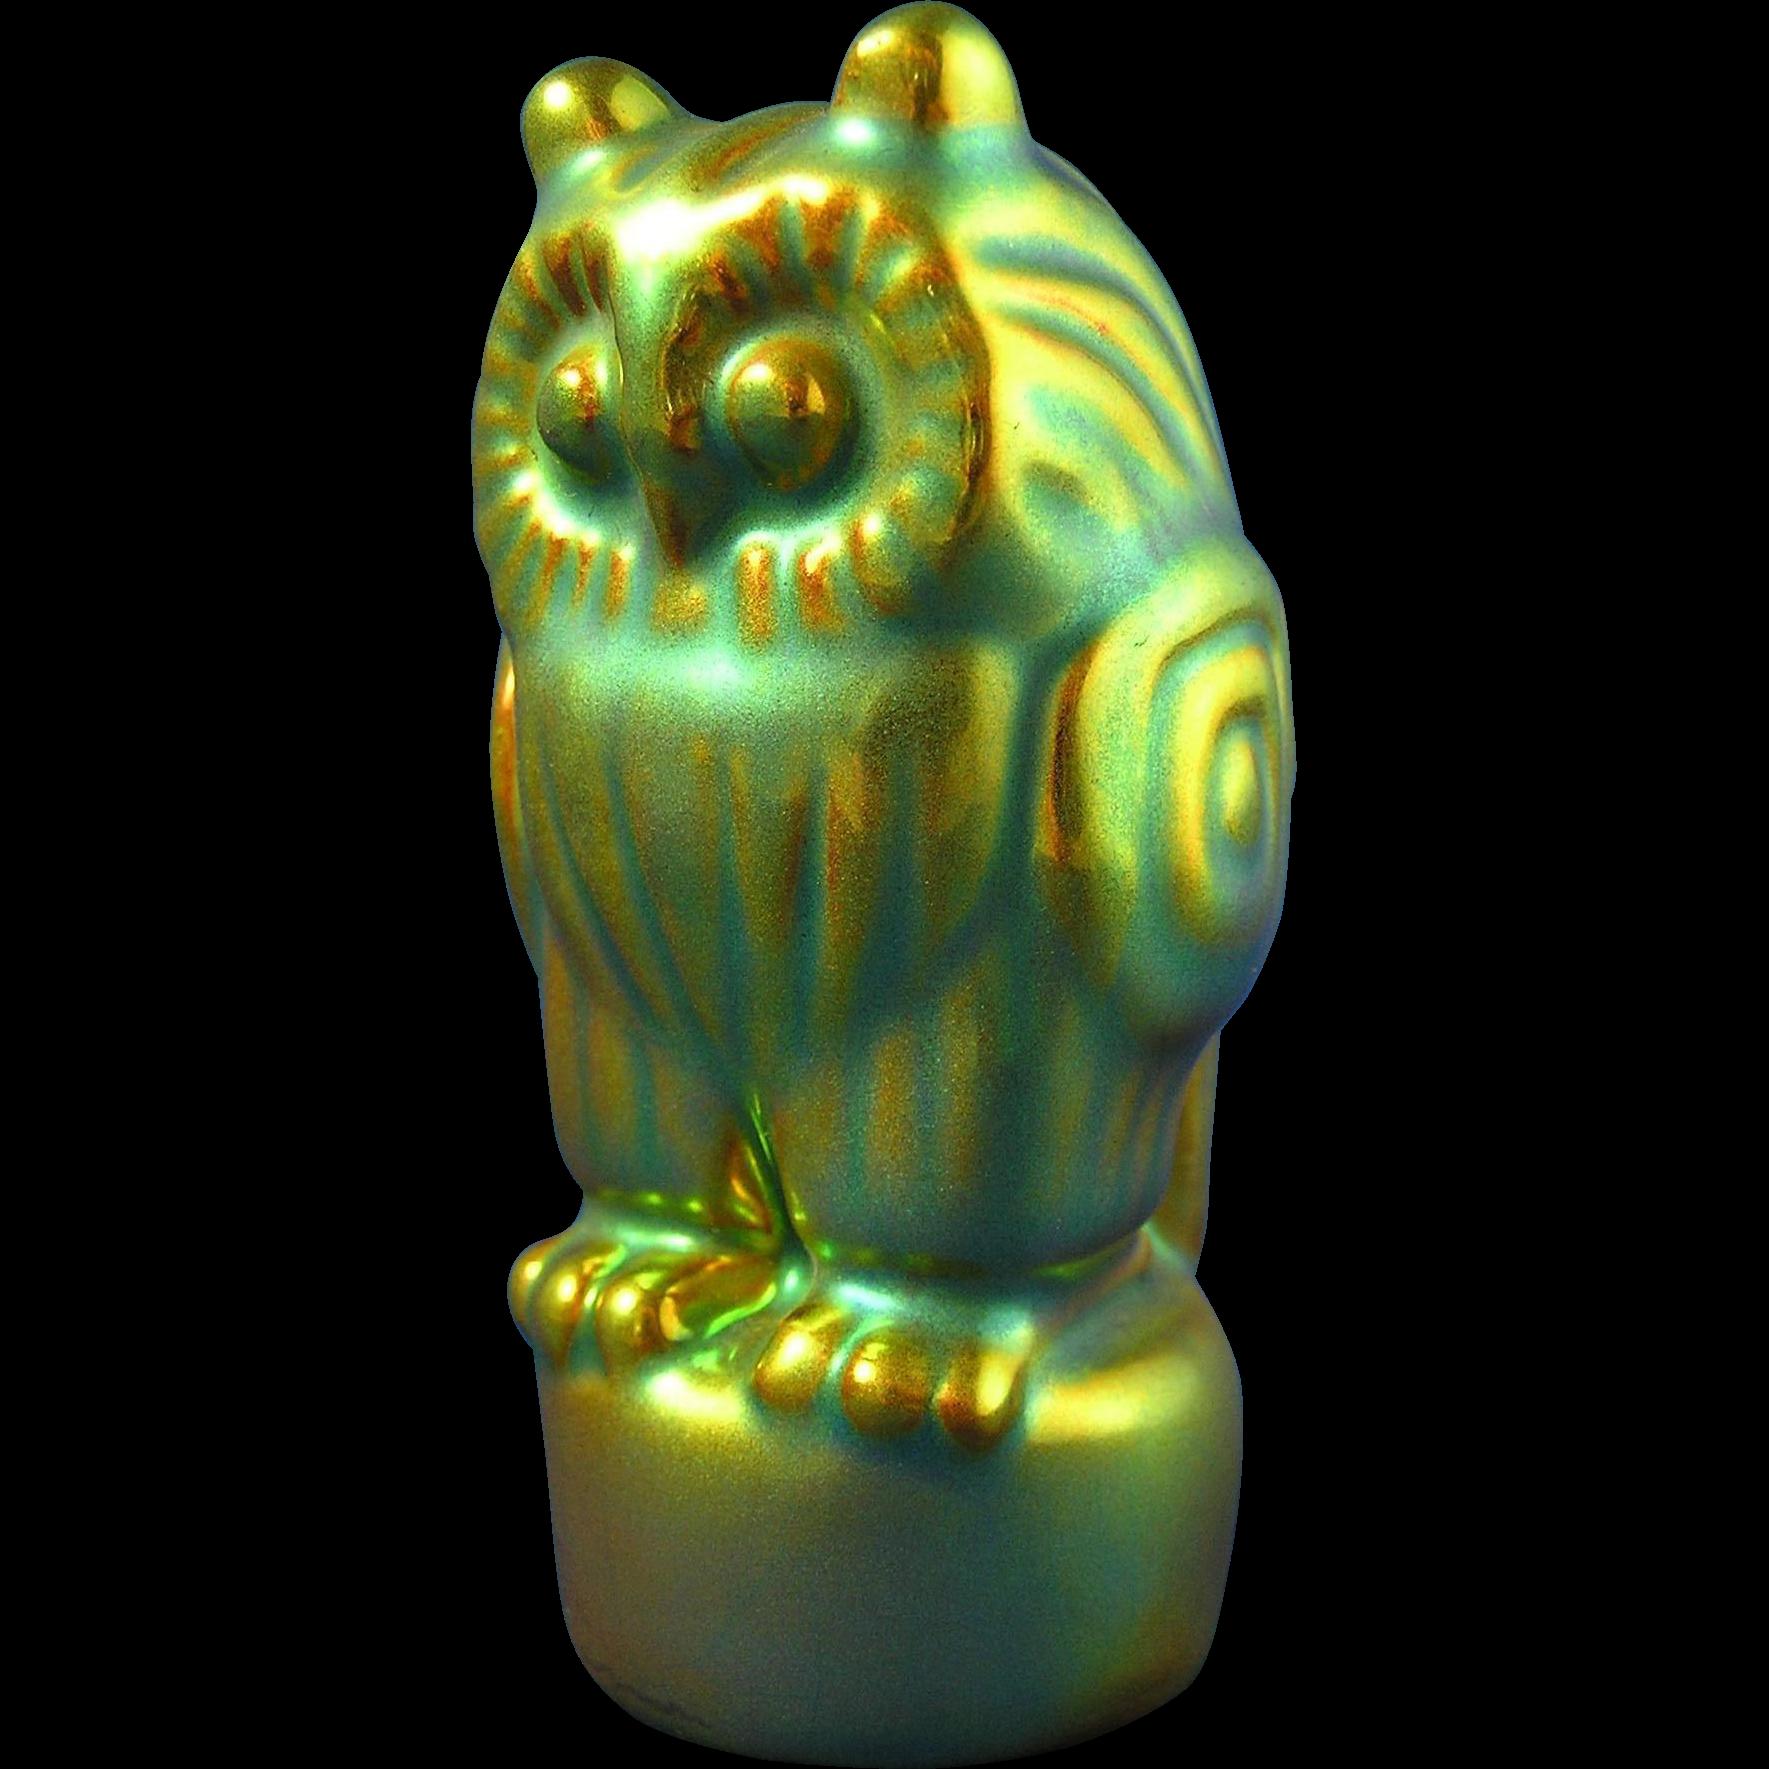 Zsolnay Hungary Eosin Green Art Deco Owl Figurine (c.1920-1940)